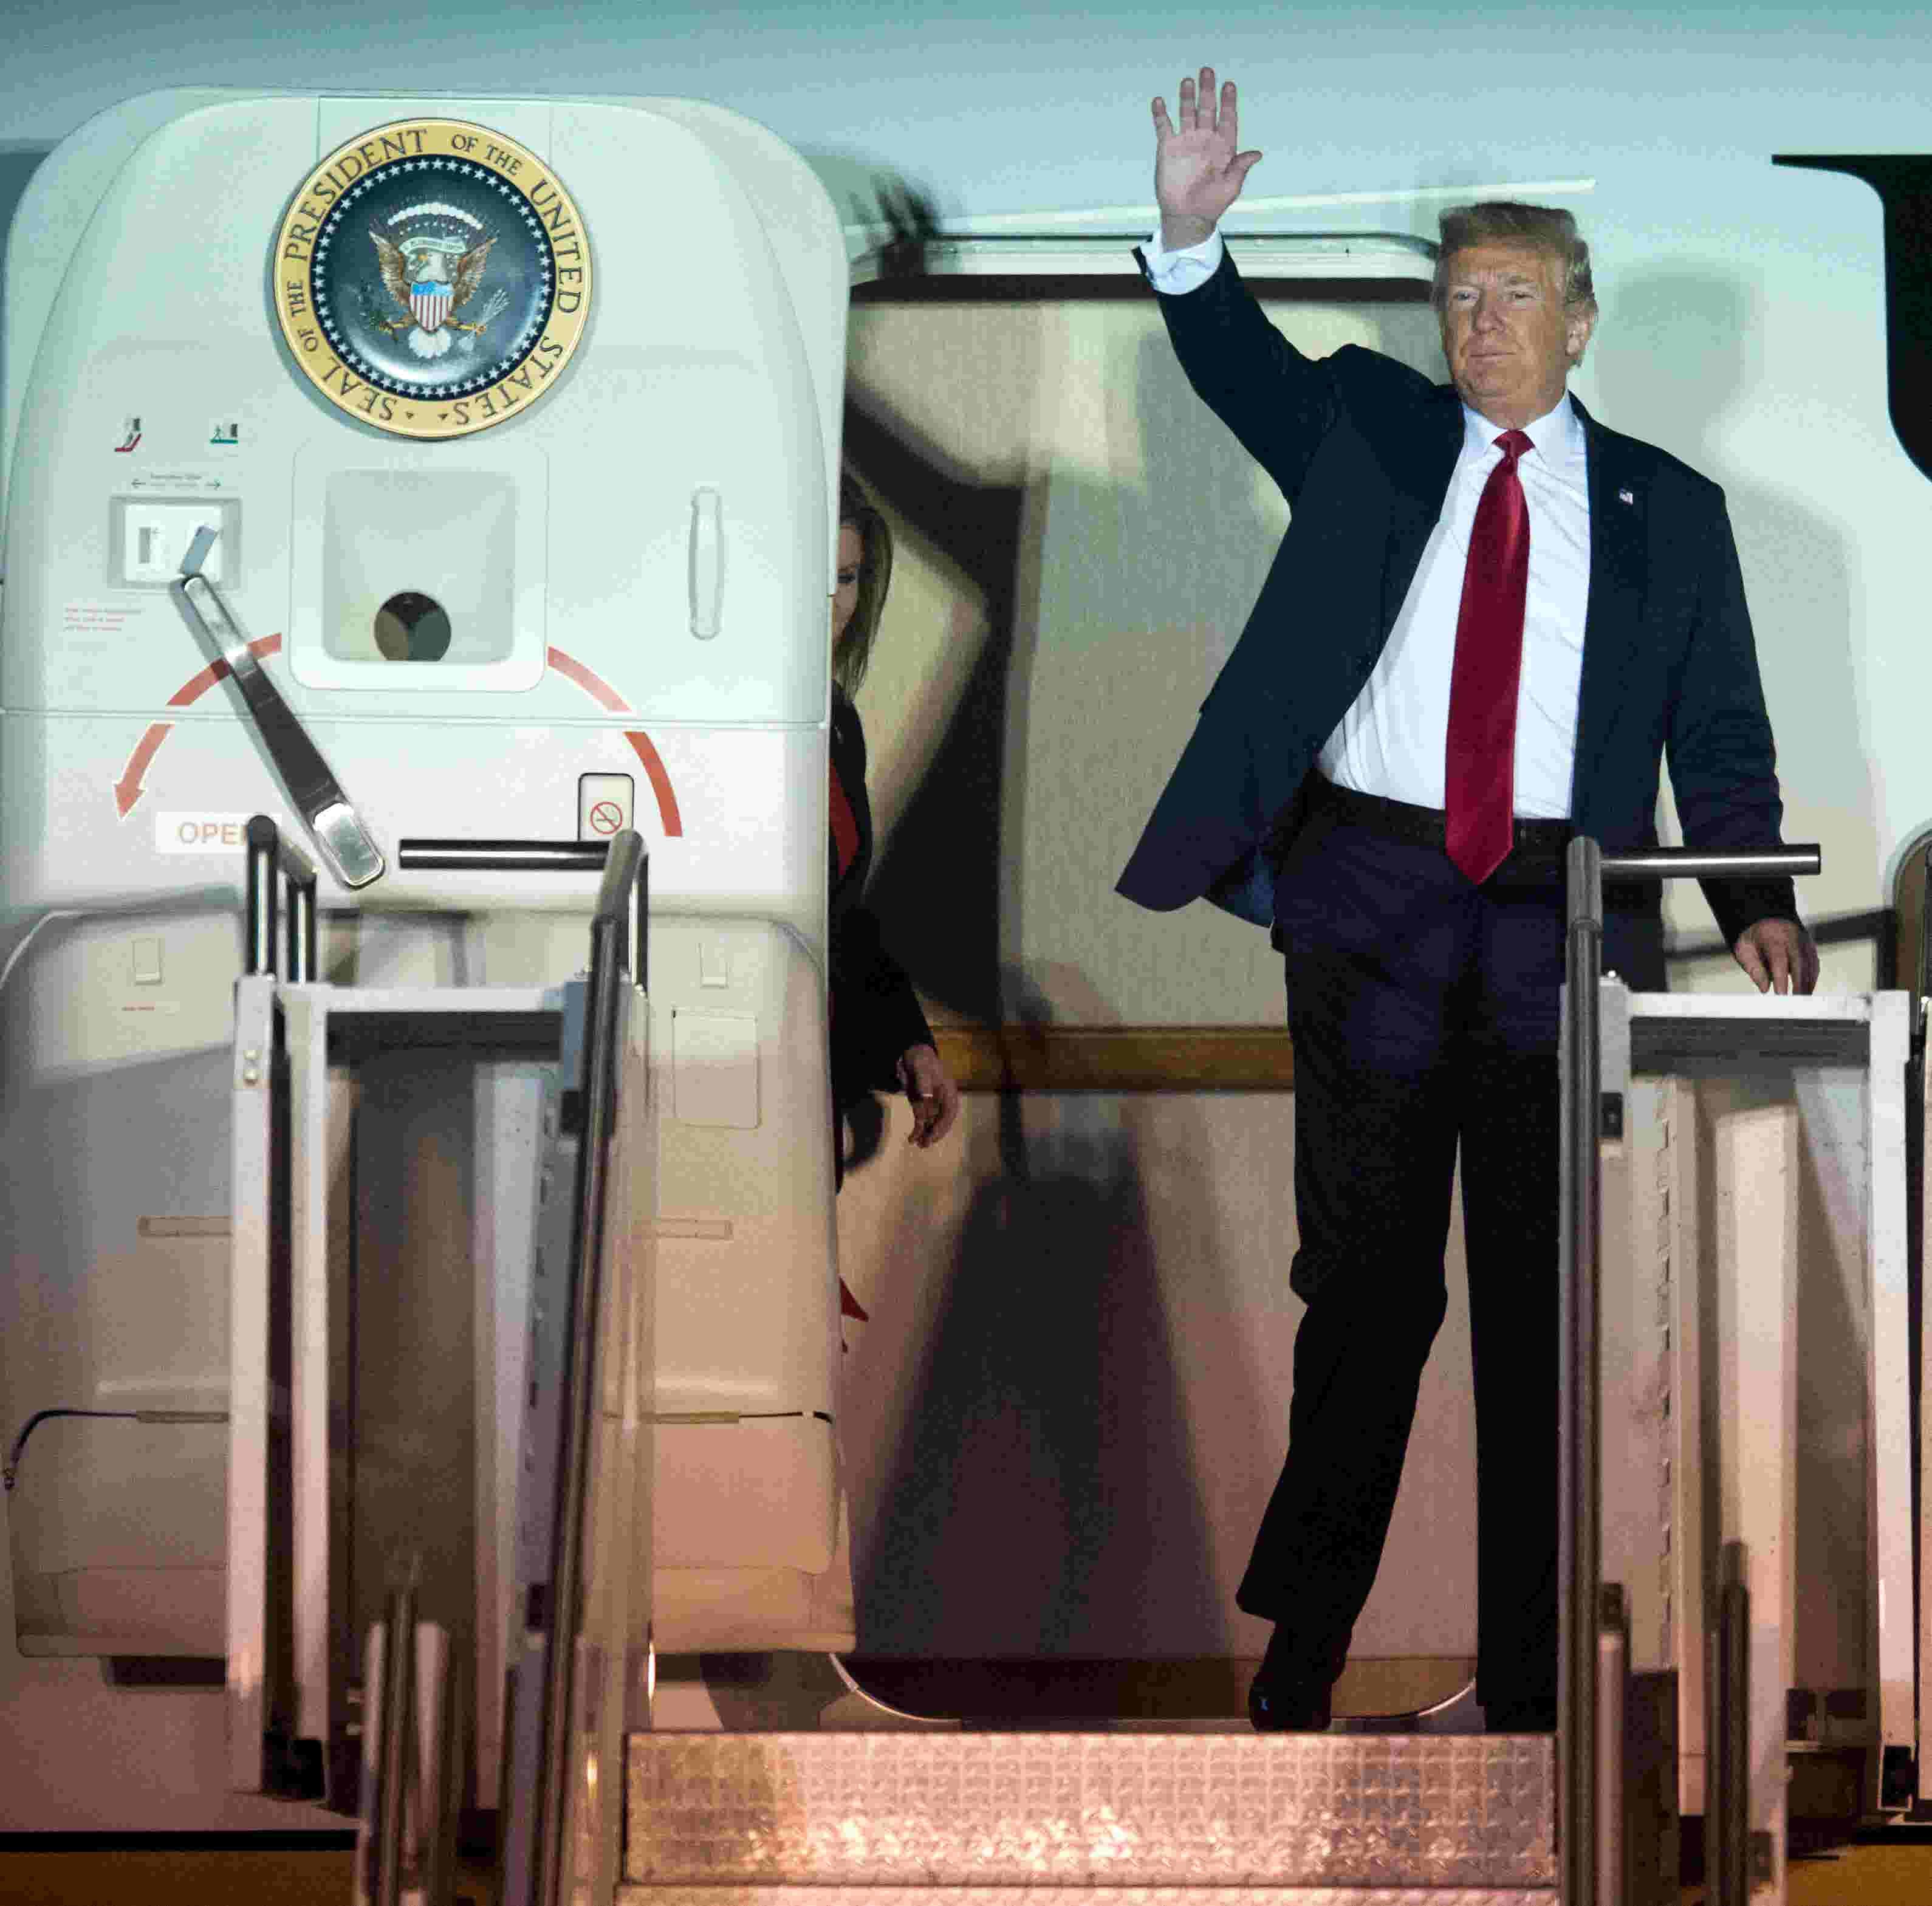 President Trump's Chattanooga rally: Trump praises Blackburn